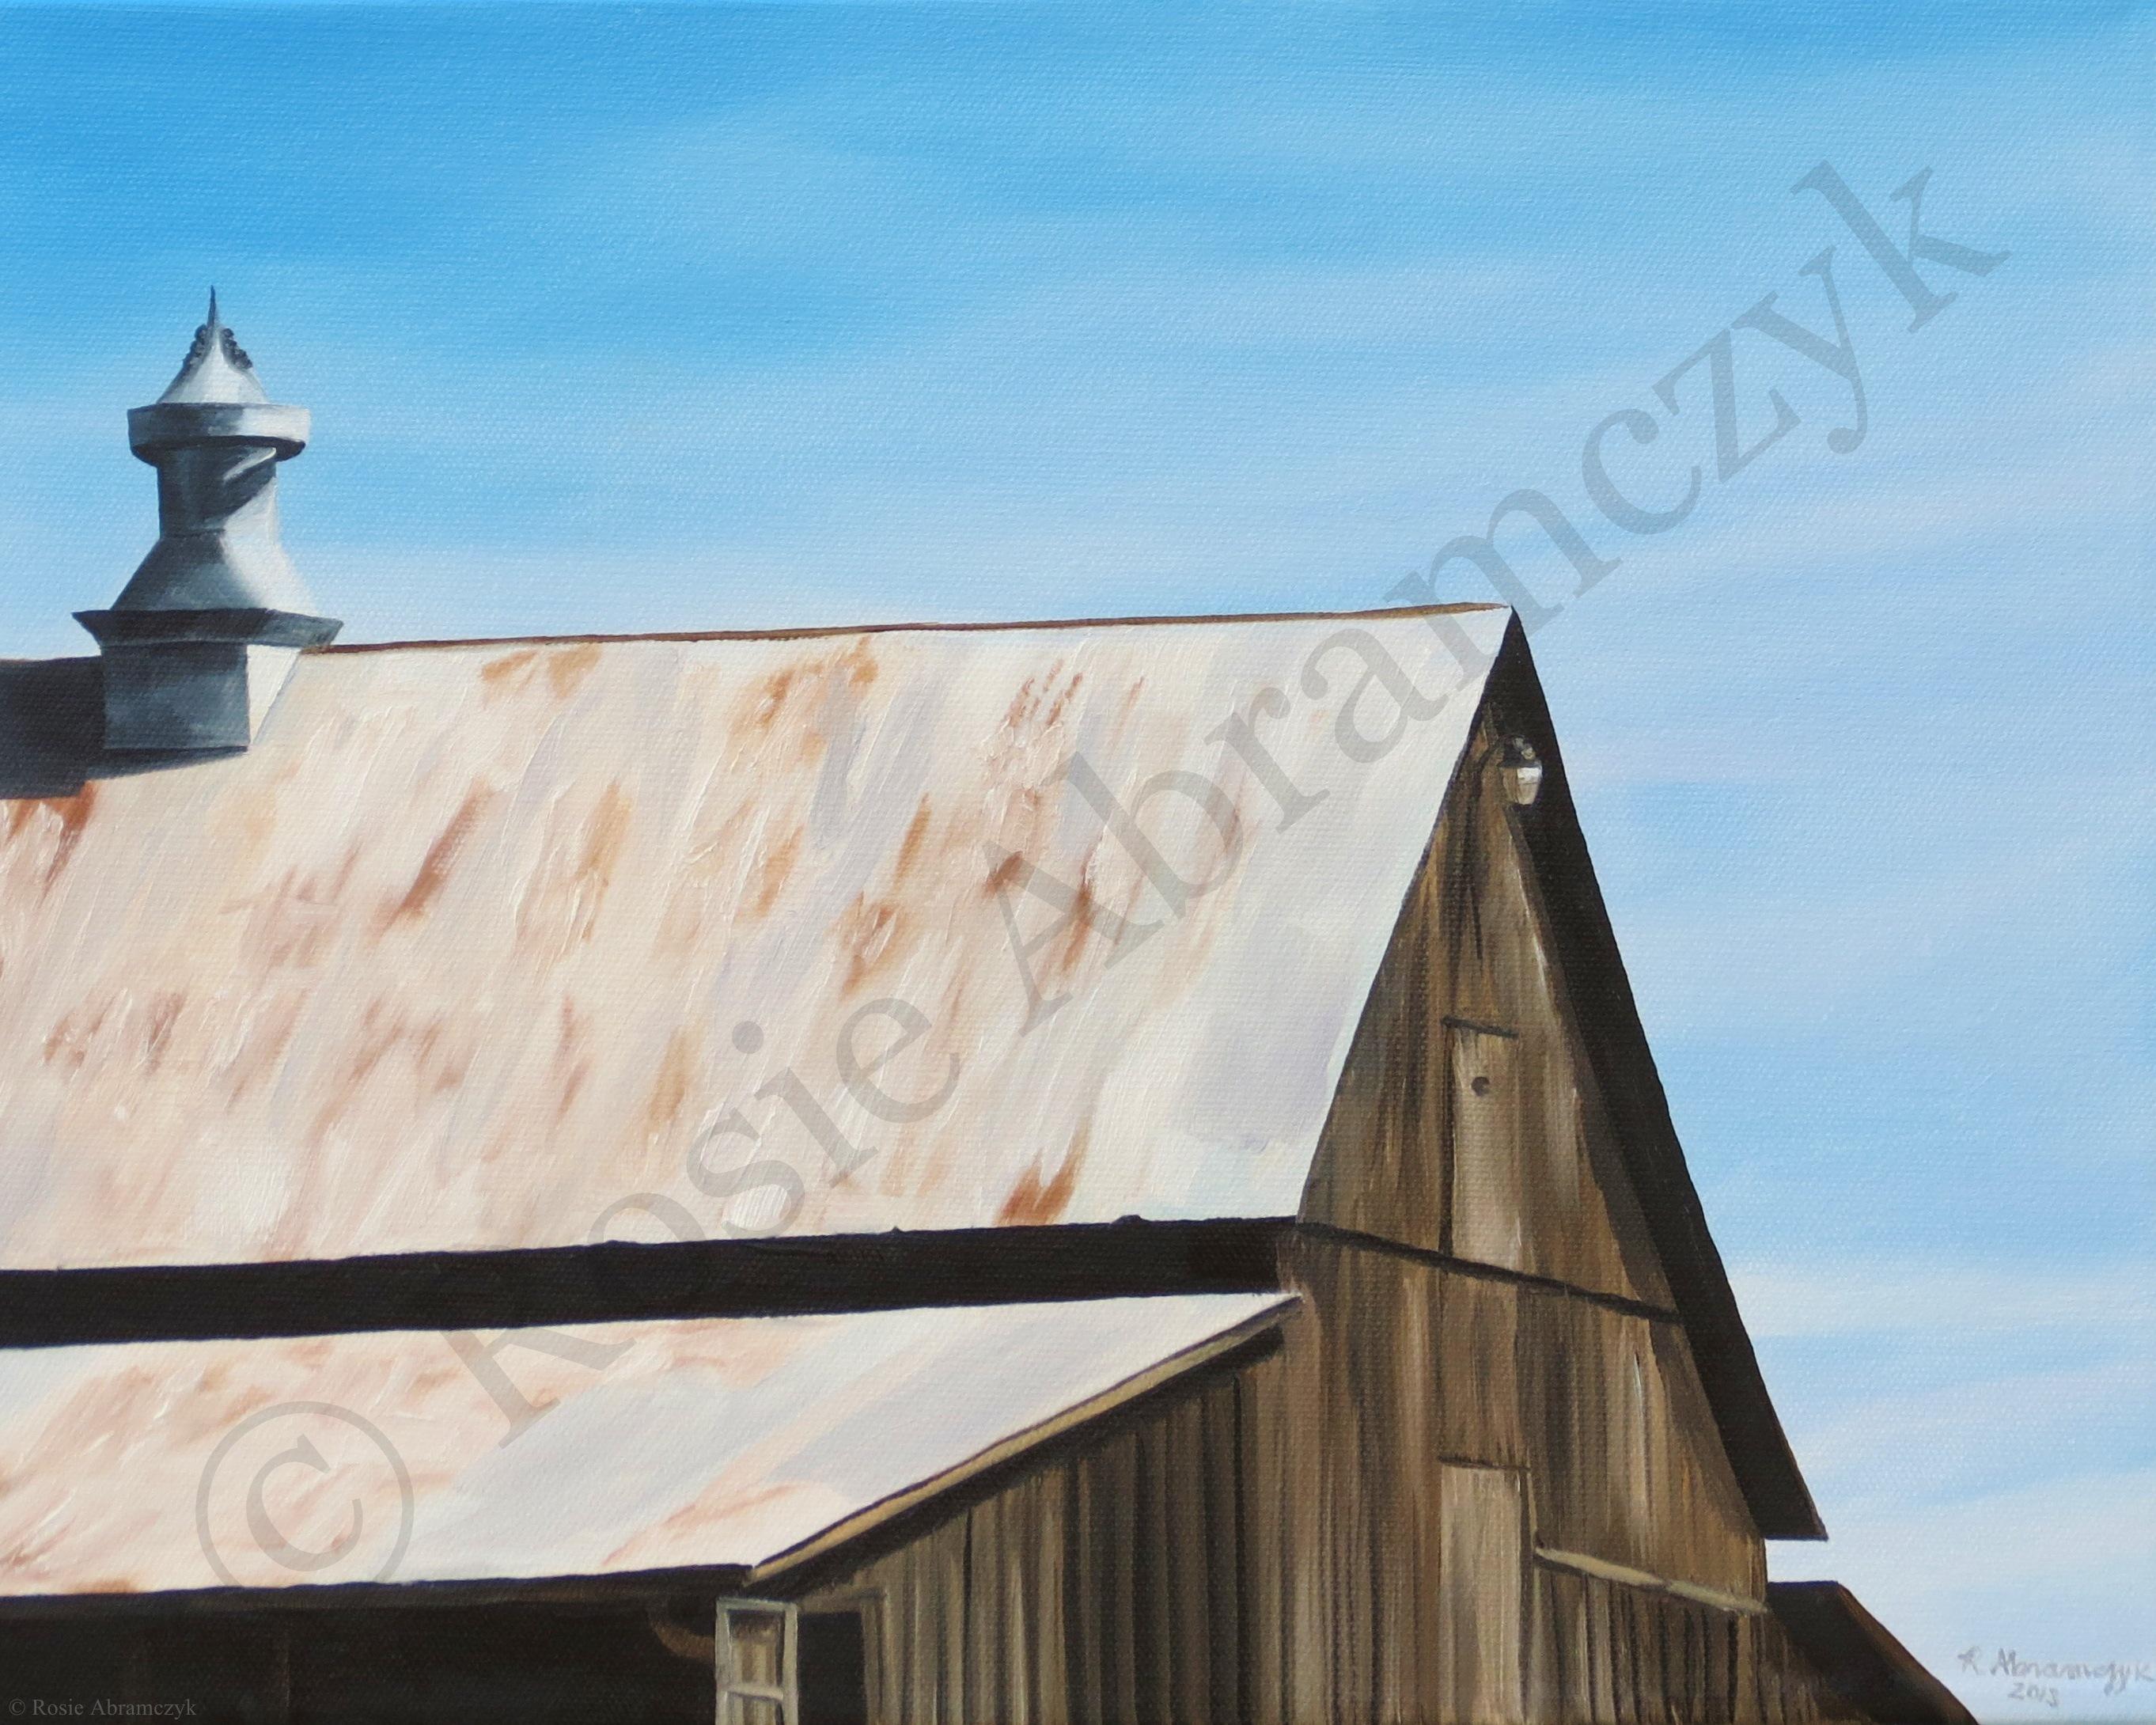 Balducci Barn, by Rosie Abramczyk, Oil Paint, 2013